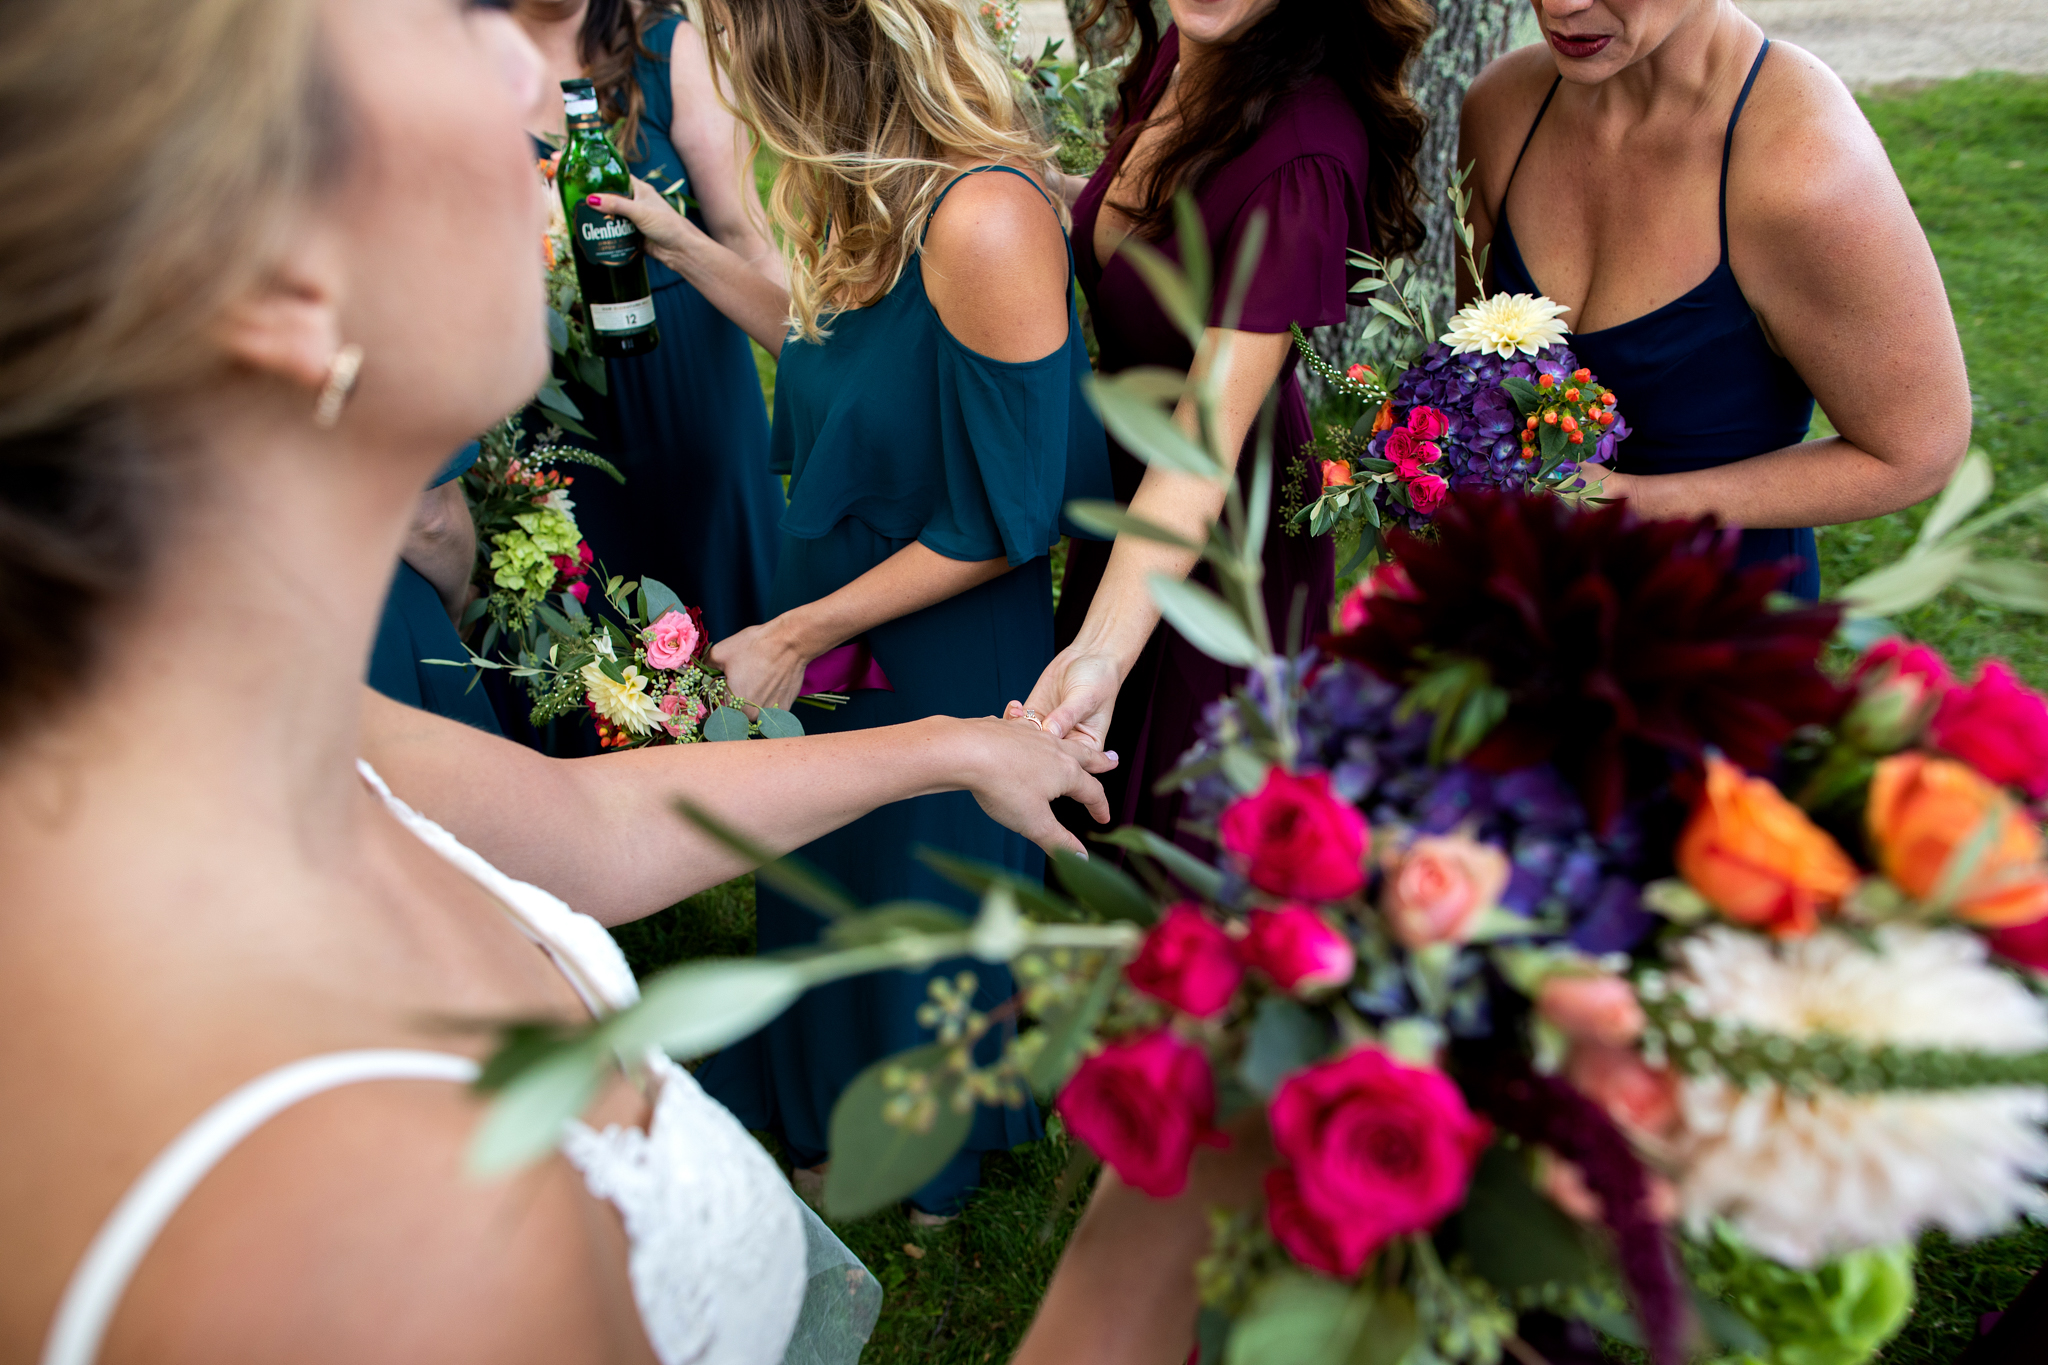 maine-farm-wedding-photographer-stepheneycollins-167.jpg